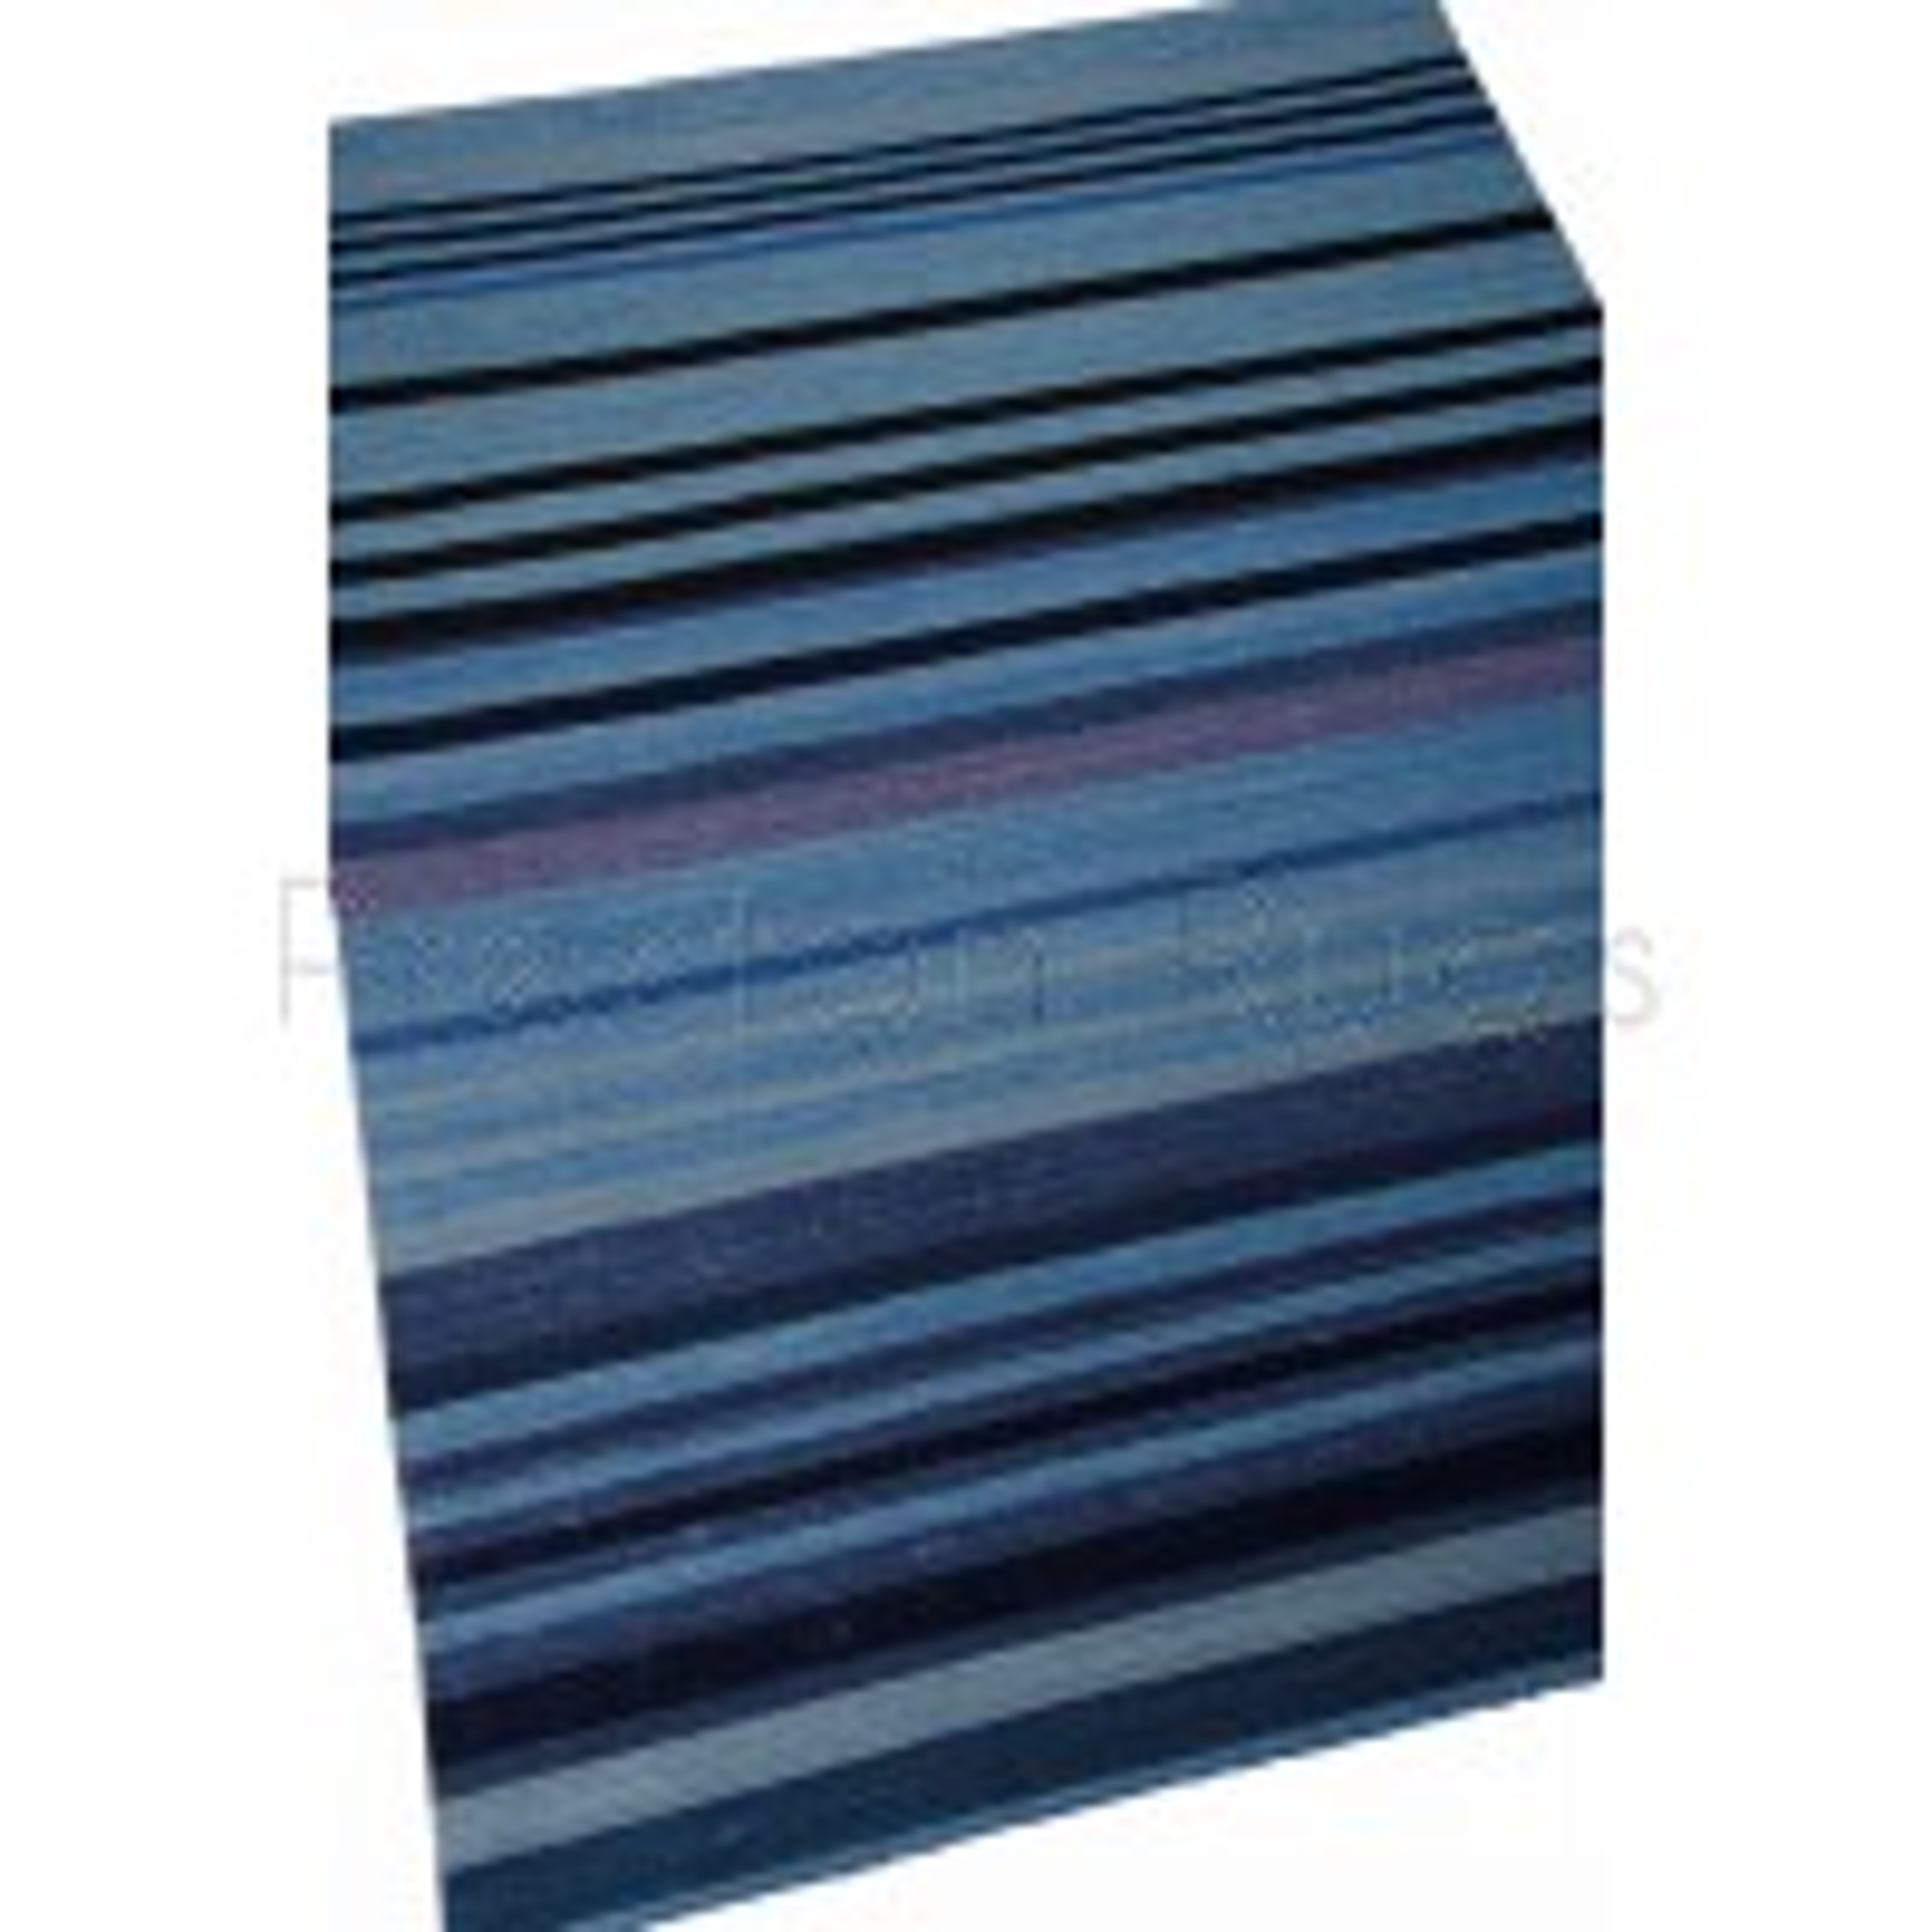 Griot Stripe Rug - Ngoma - KI801 Indigo-122 x 183 cm (4' x 6')